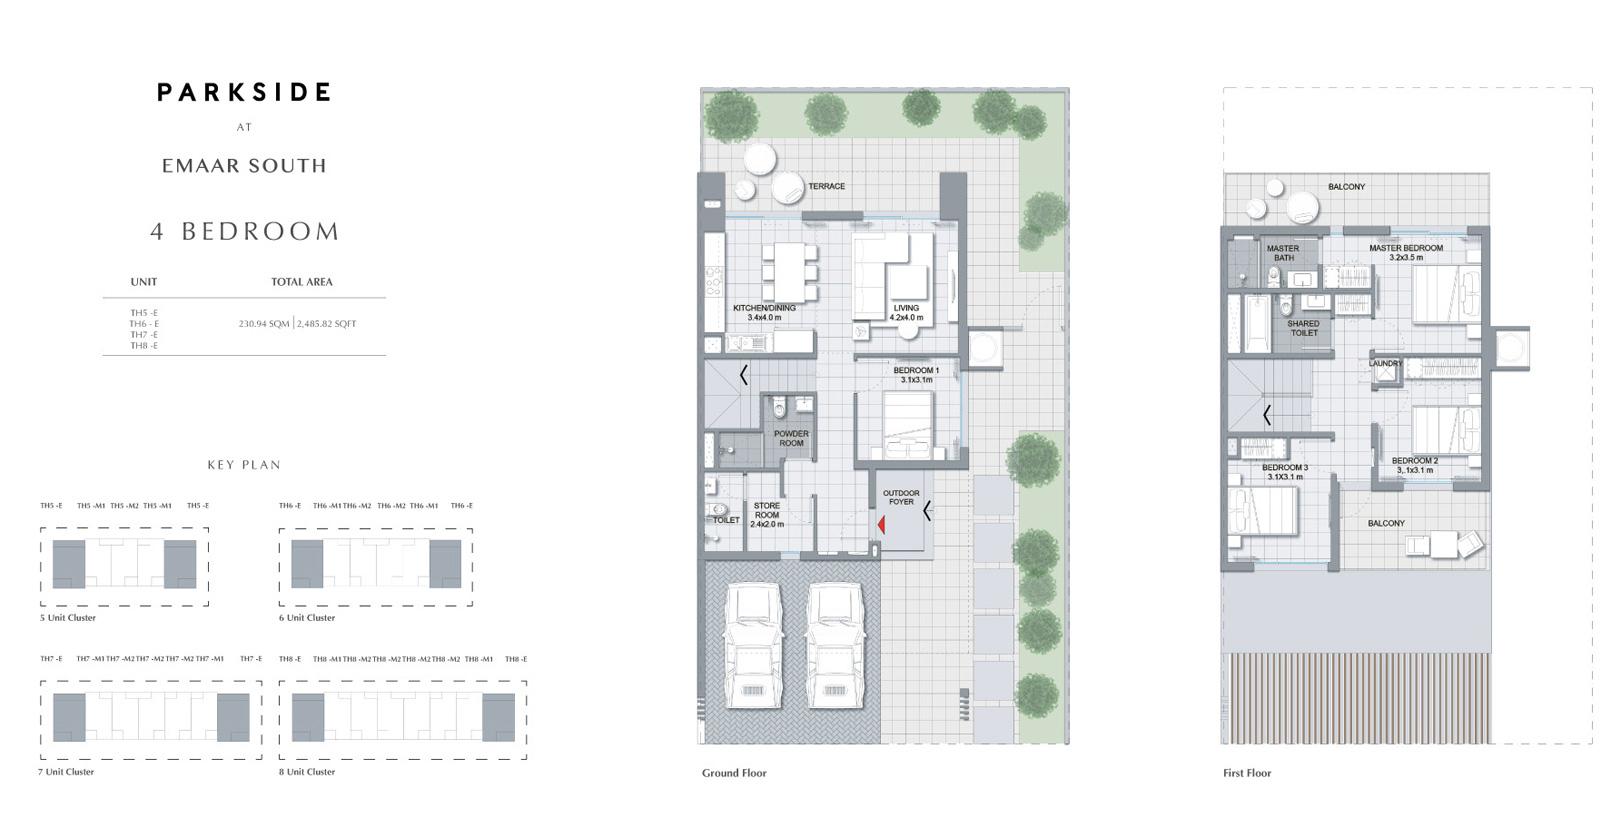 4 Bedroom - Size 2,485.82 Sq Ft